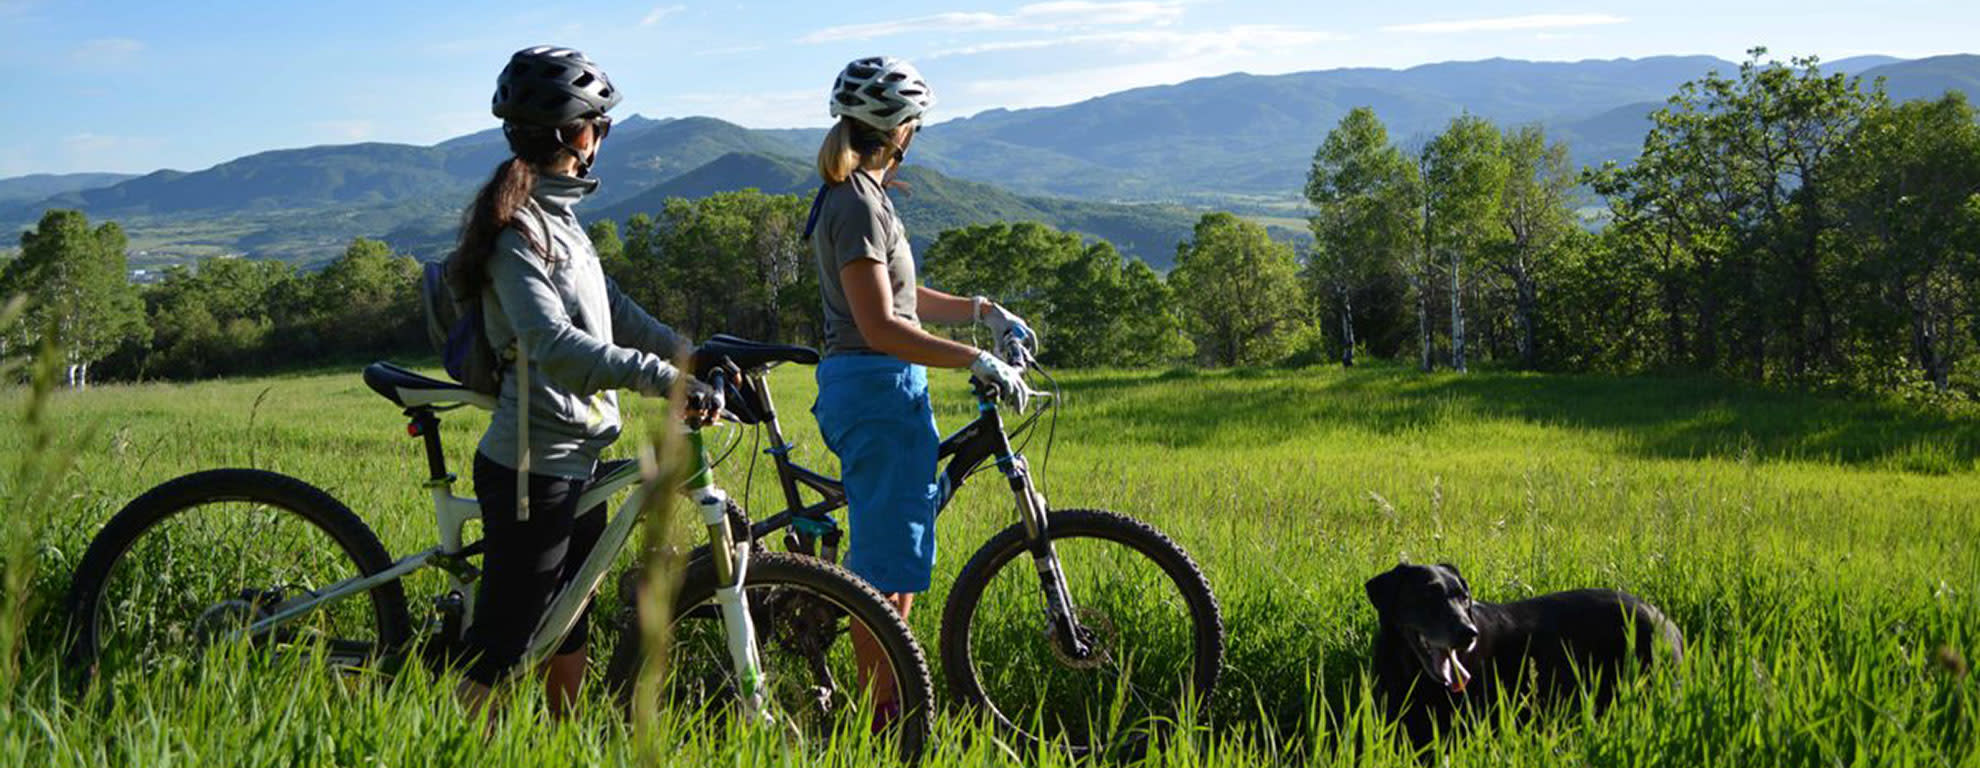 Emerald Mountain Biking